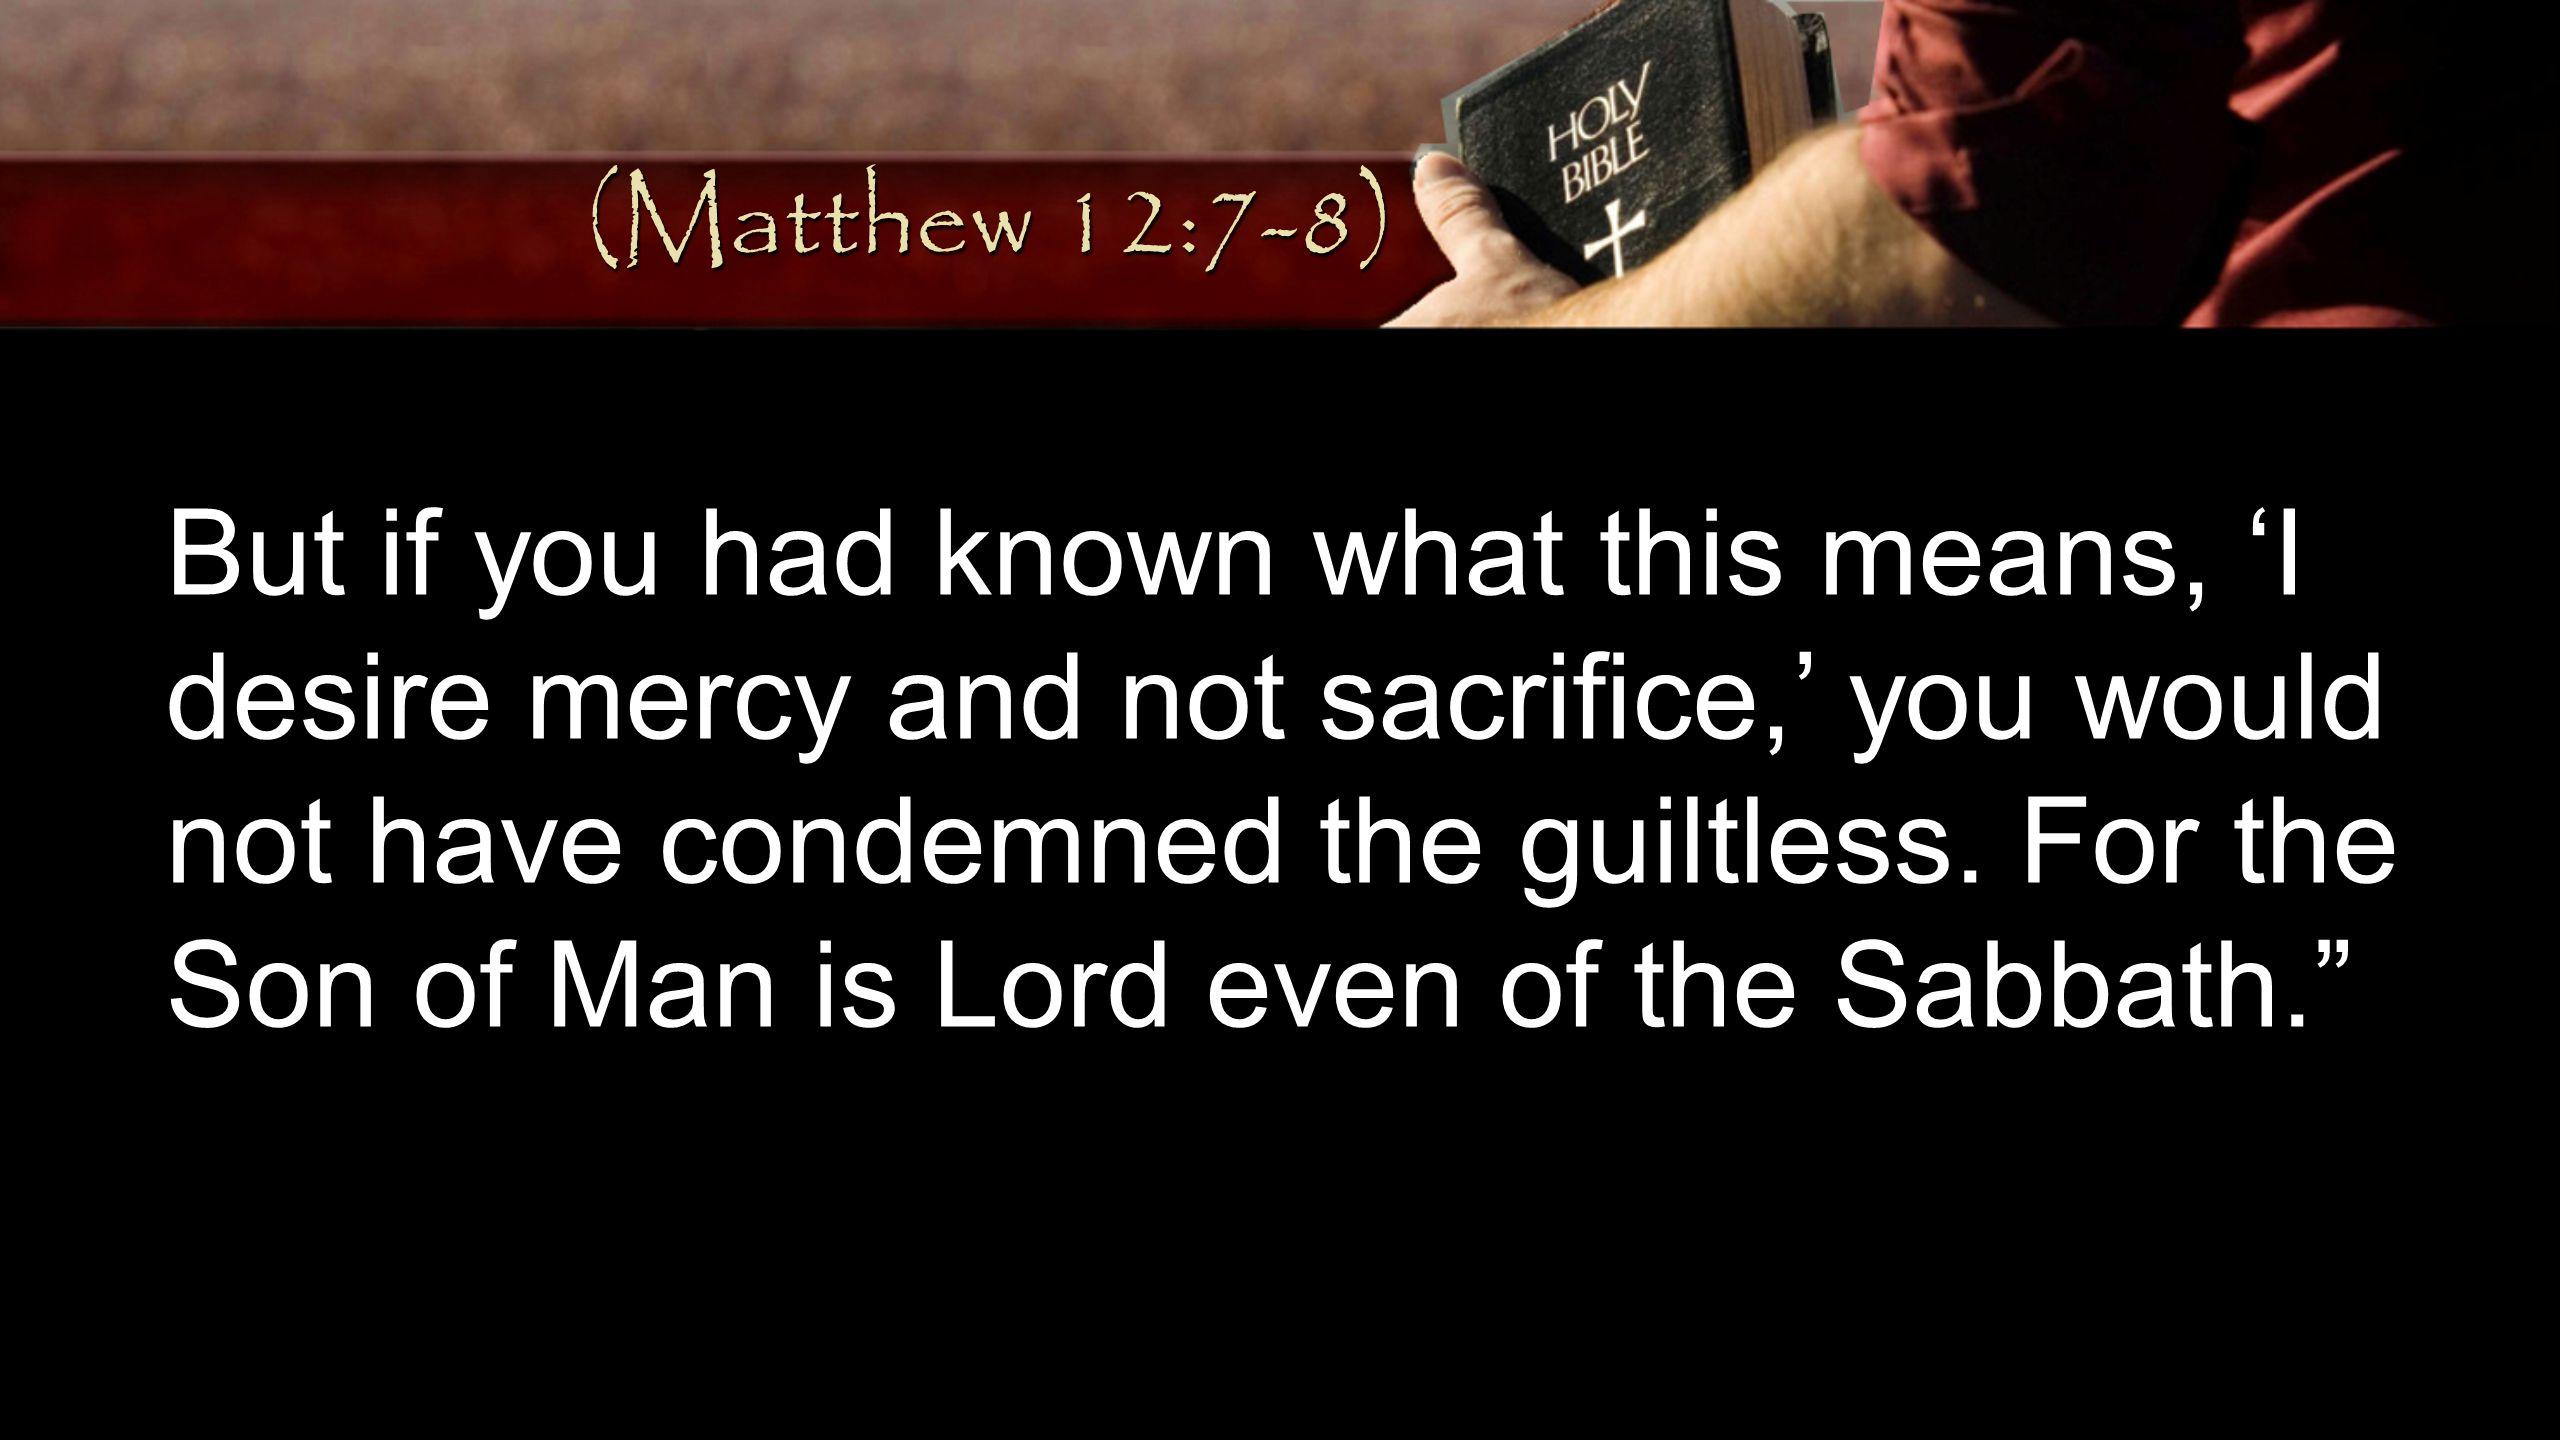 (Matthew 12:7-8)